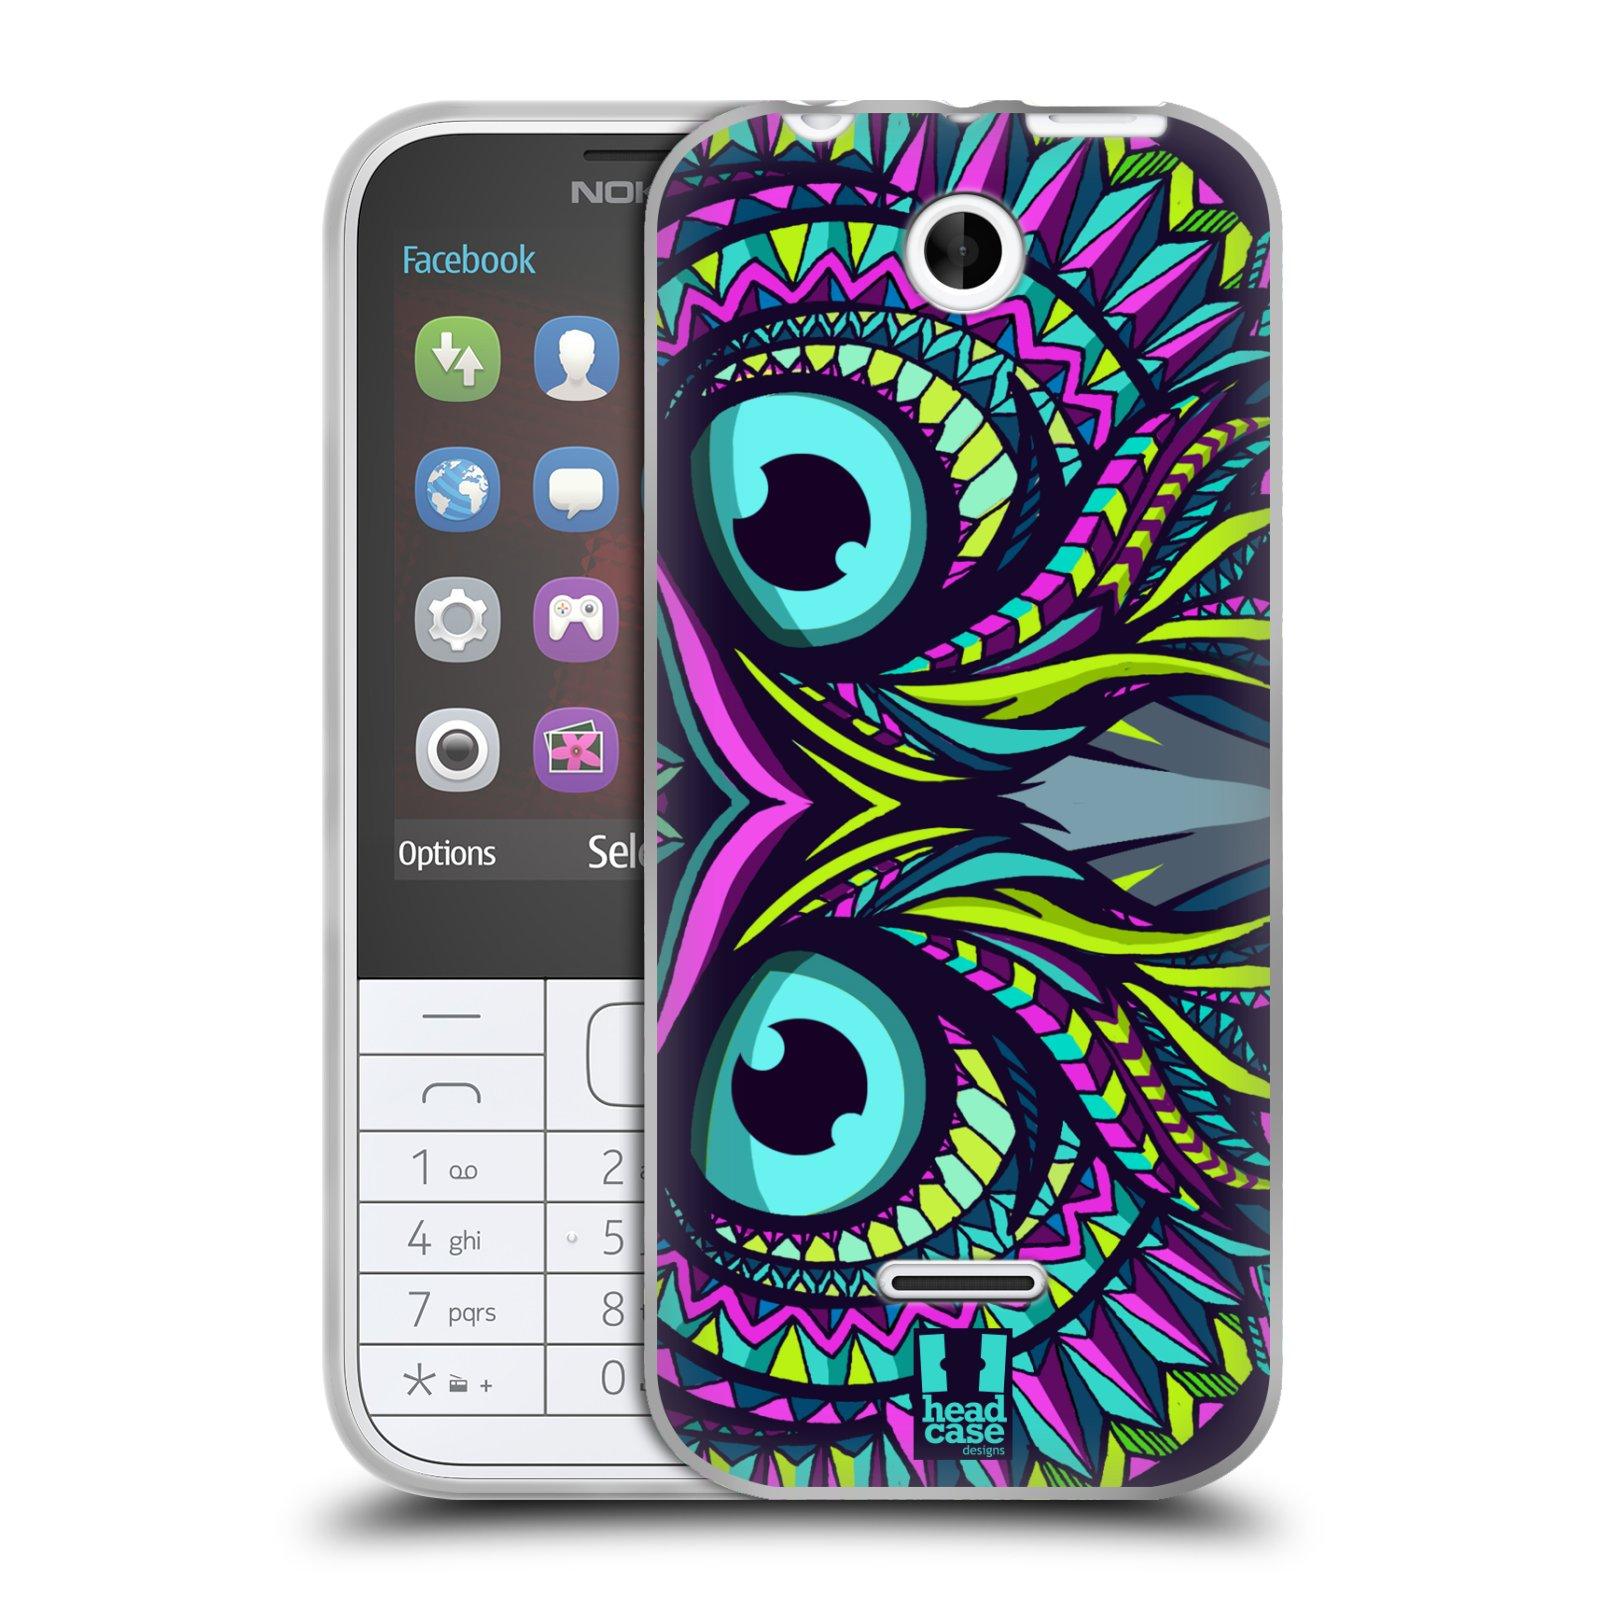 Silikonové pouzdro na mobil Nokia 225 HEAD CASE AZTEC SOVA (Silikonový kryt či obal na mobilní telefon Nokia 225)